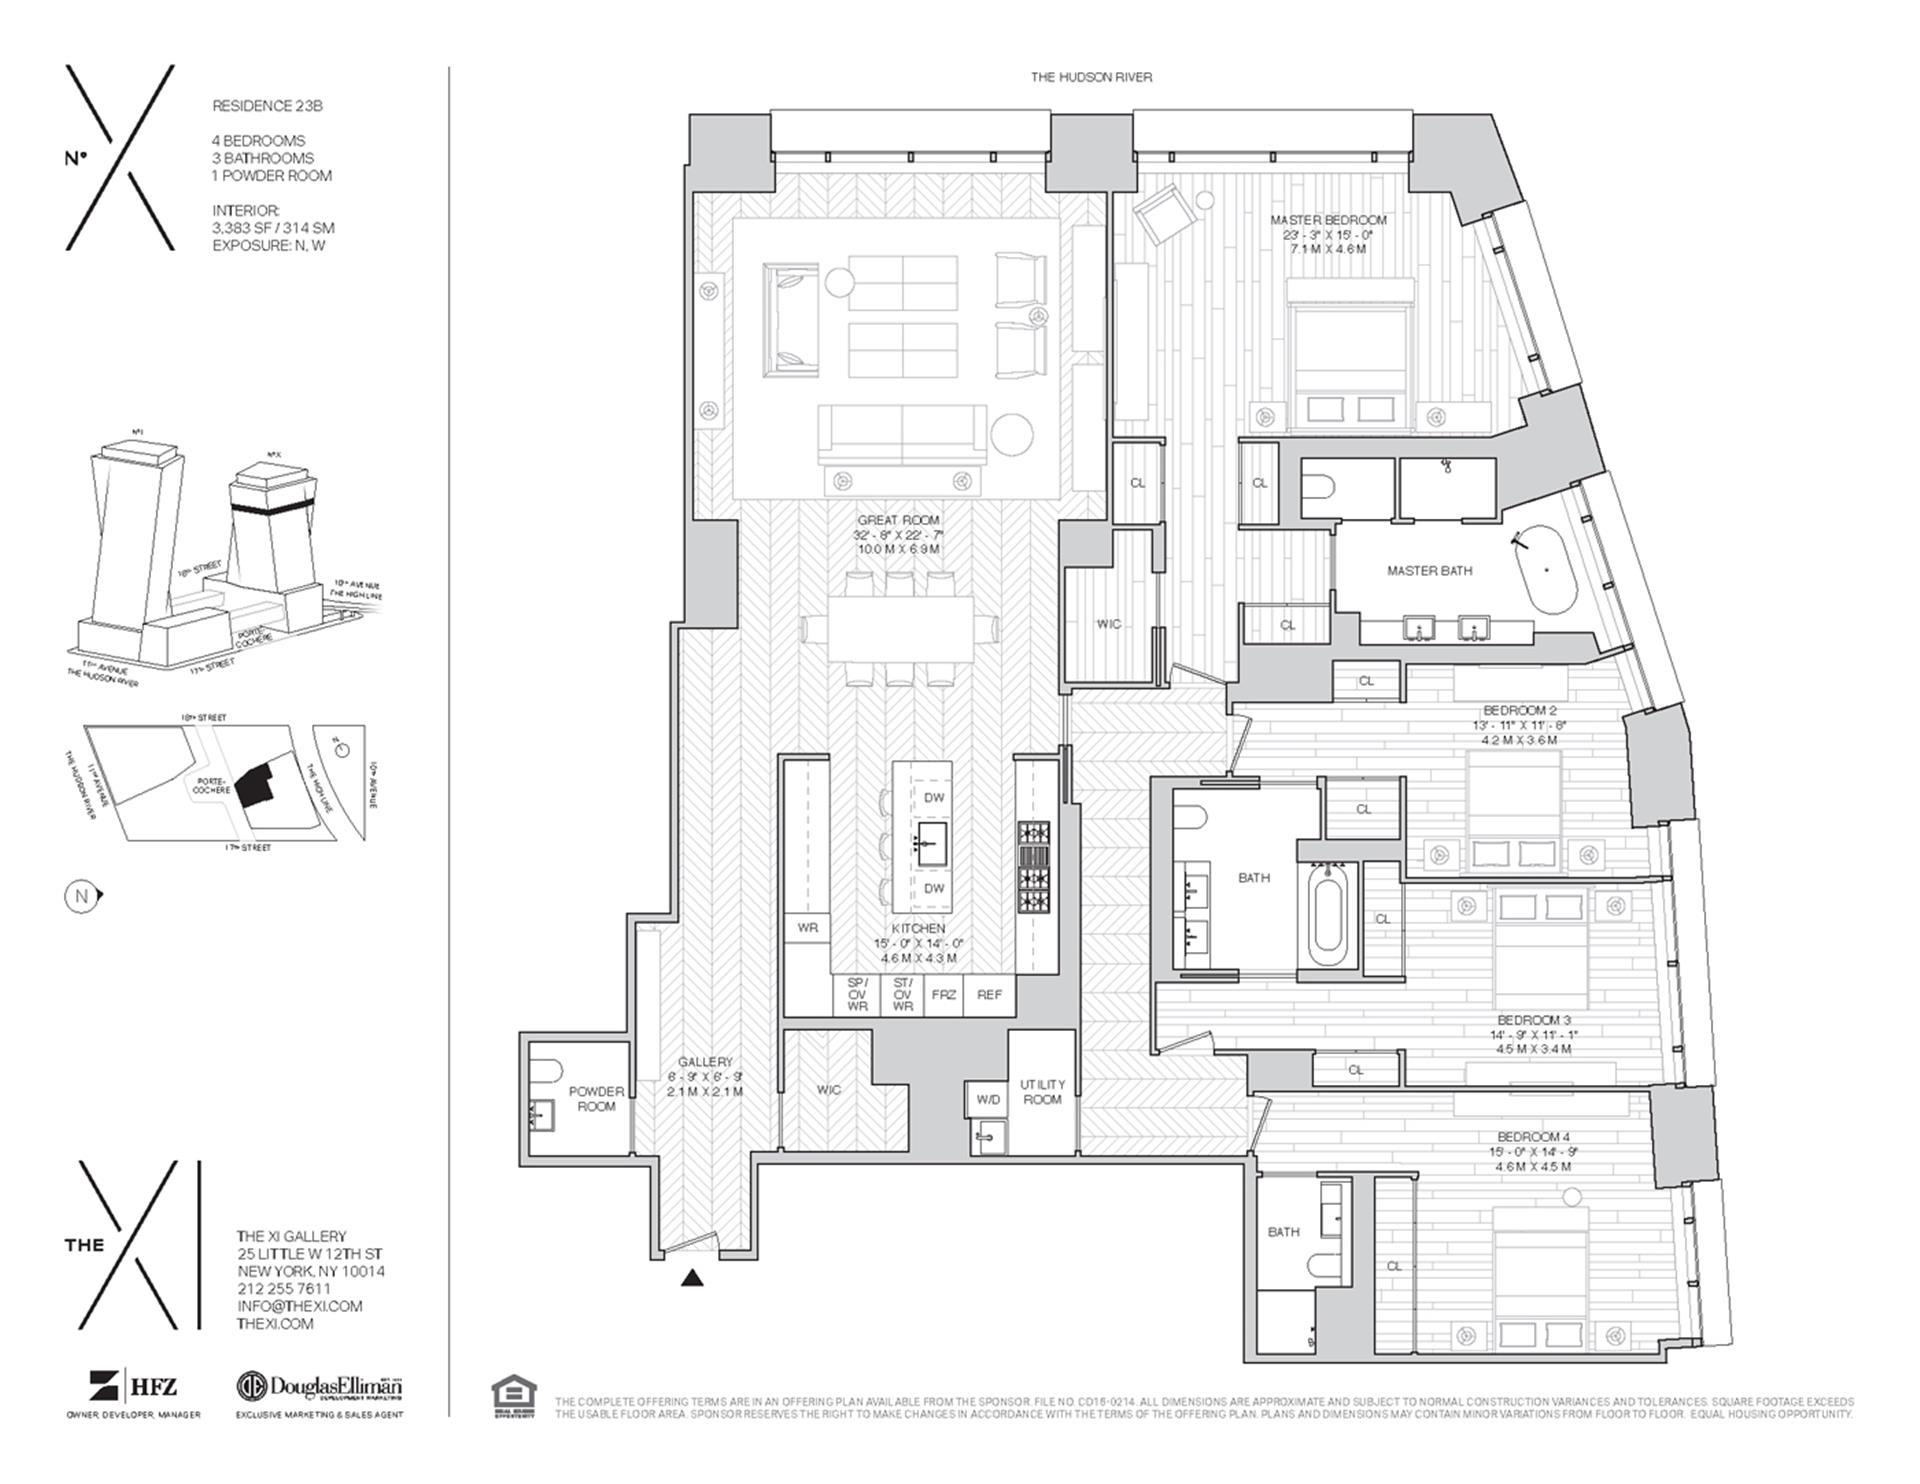 Floor plan of The XI, 76 Eleventh Avenue, X23B - Chelsea, New York